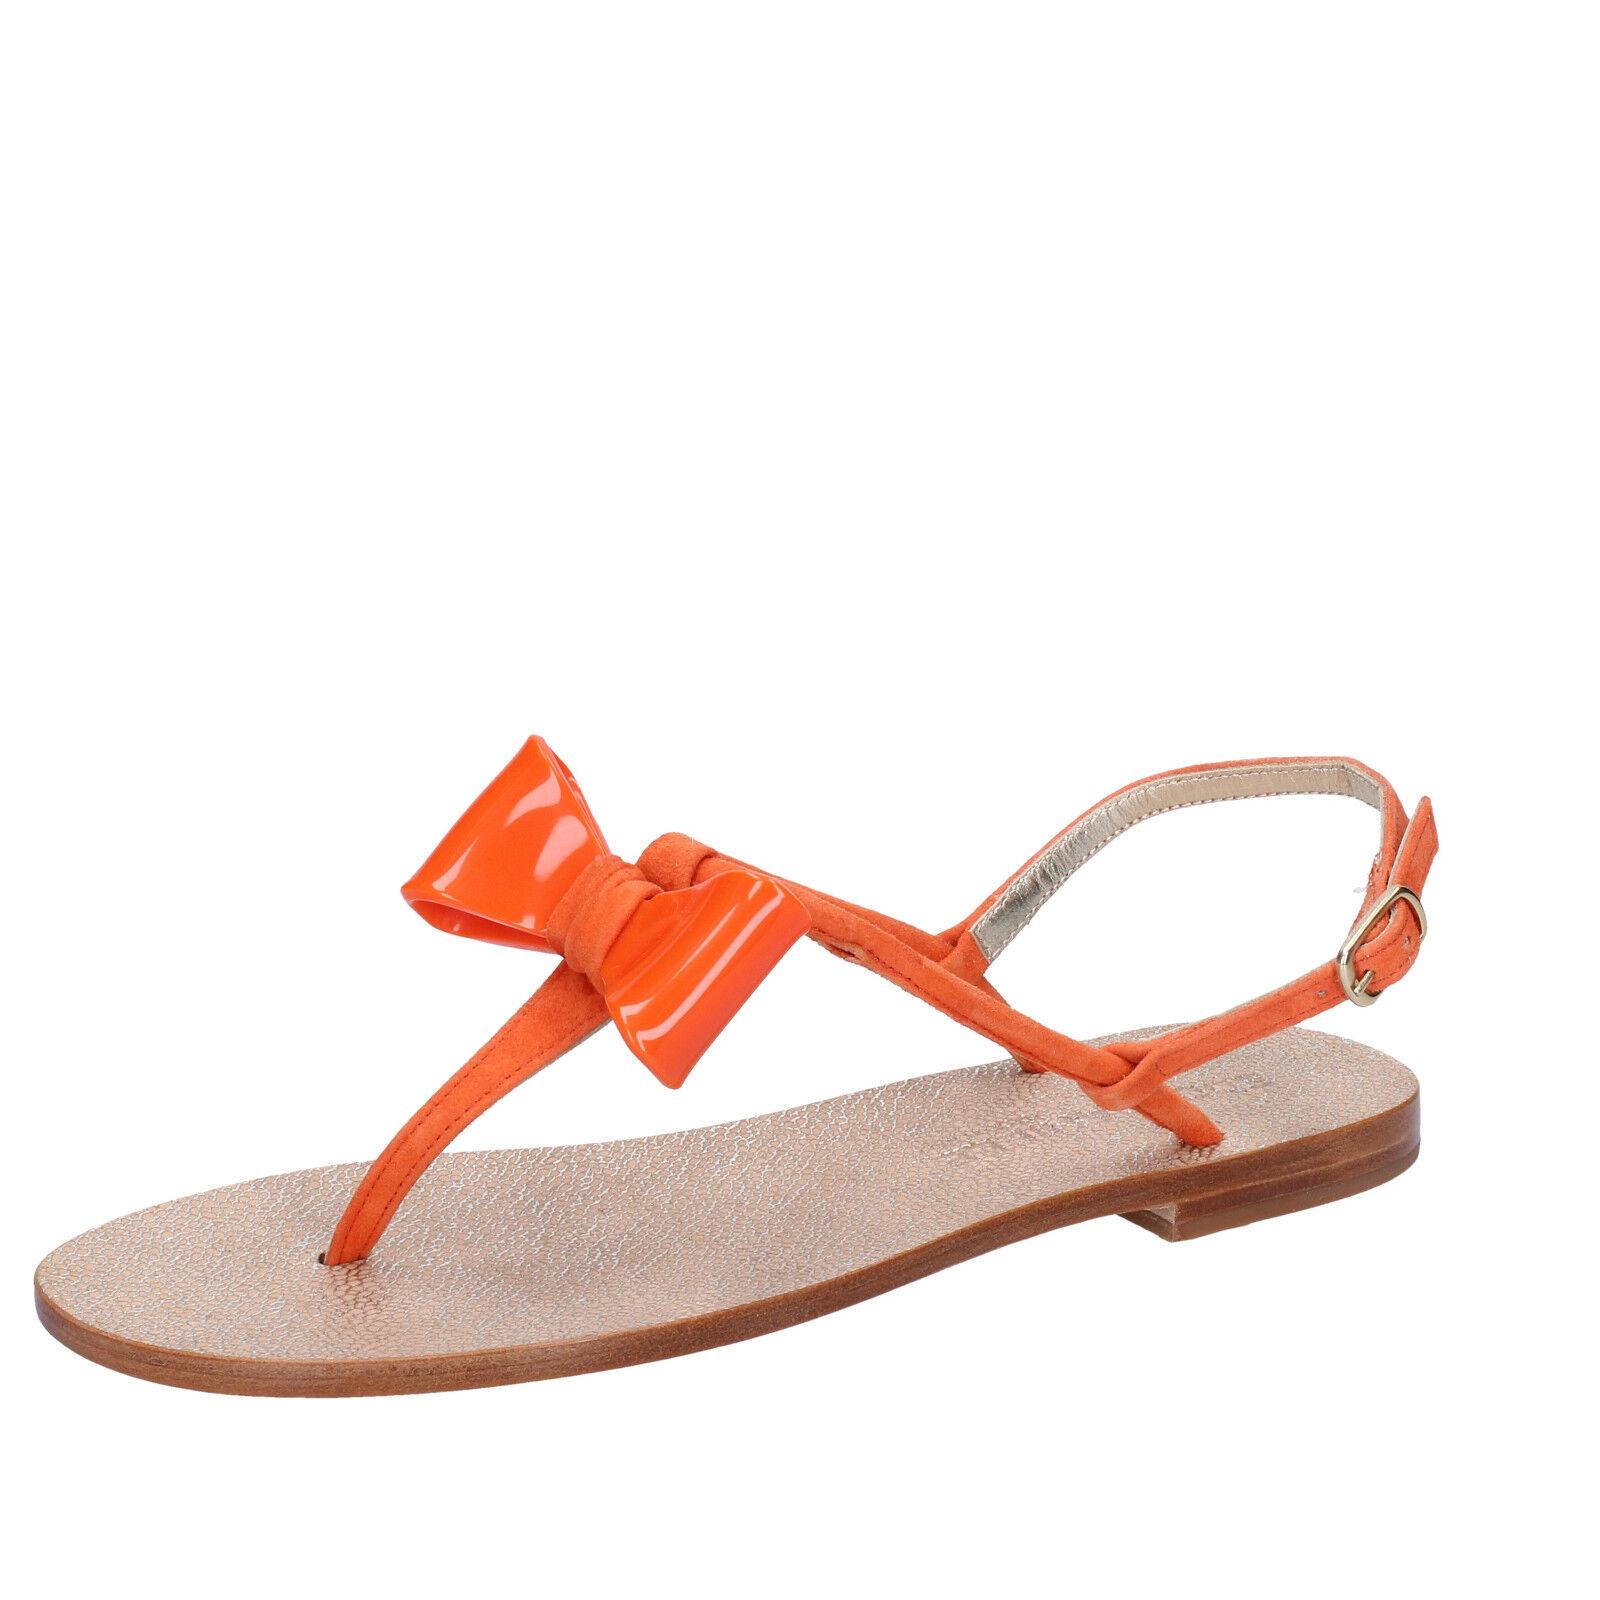 Damen schuhe EDDY DANIELE 37 EU Sandale Sandale EU orange wildleder AW215-37 85cb44